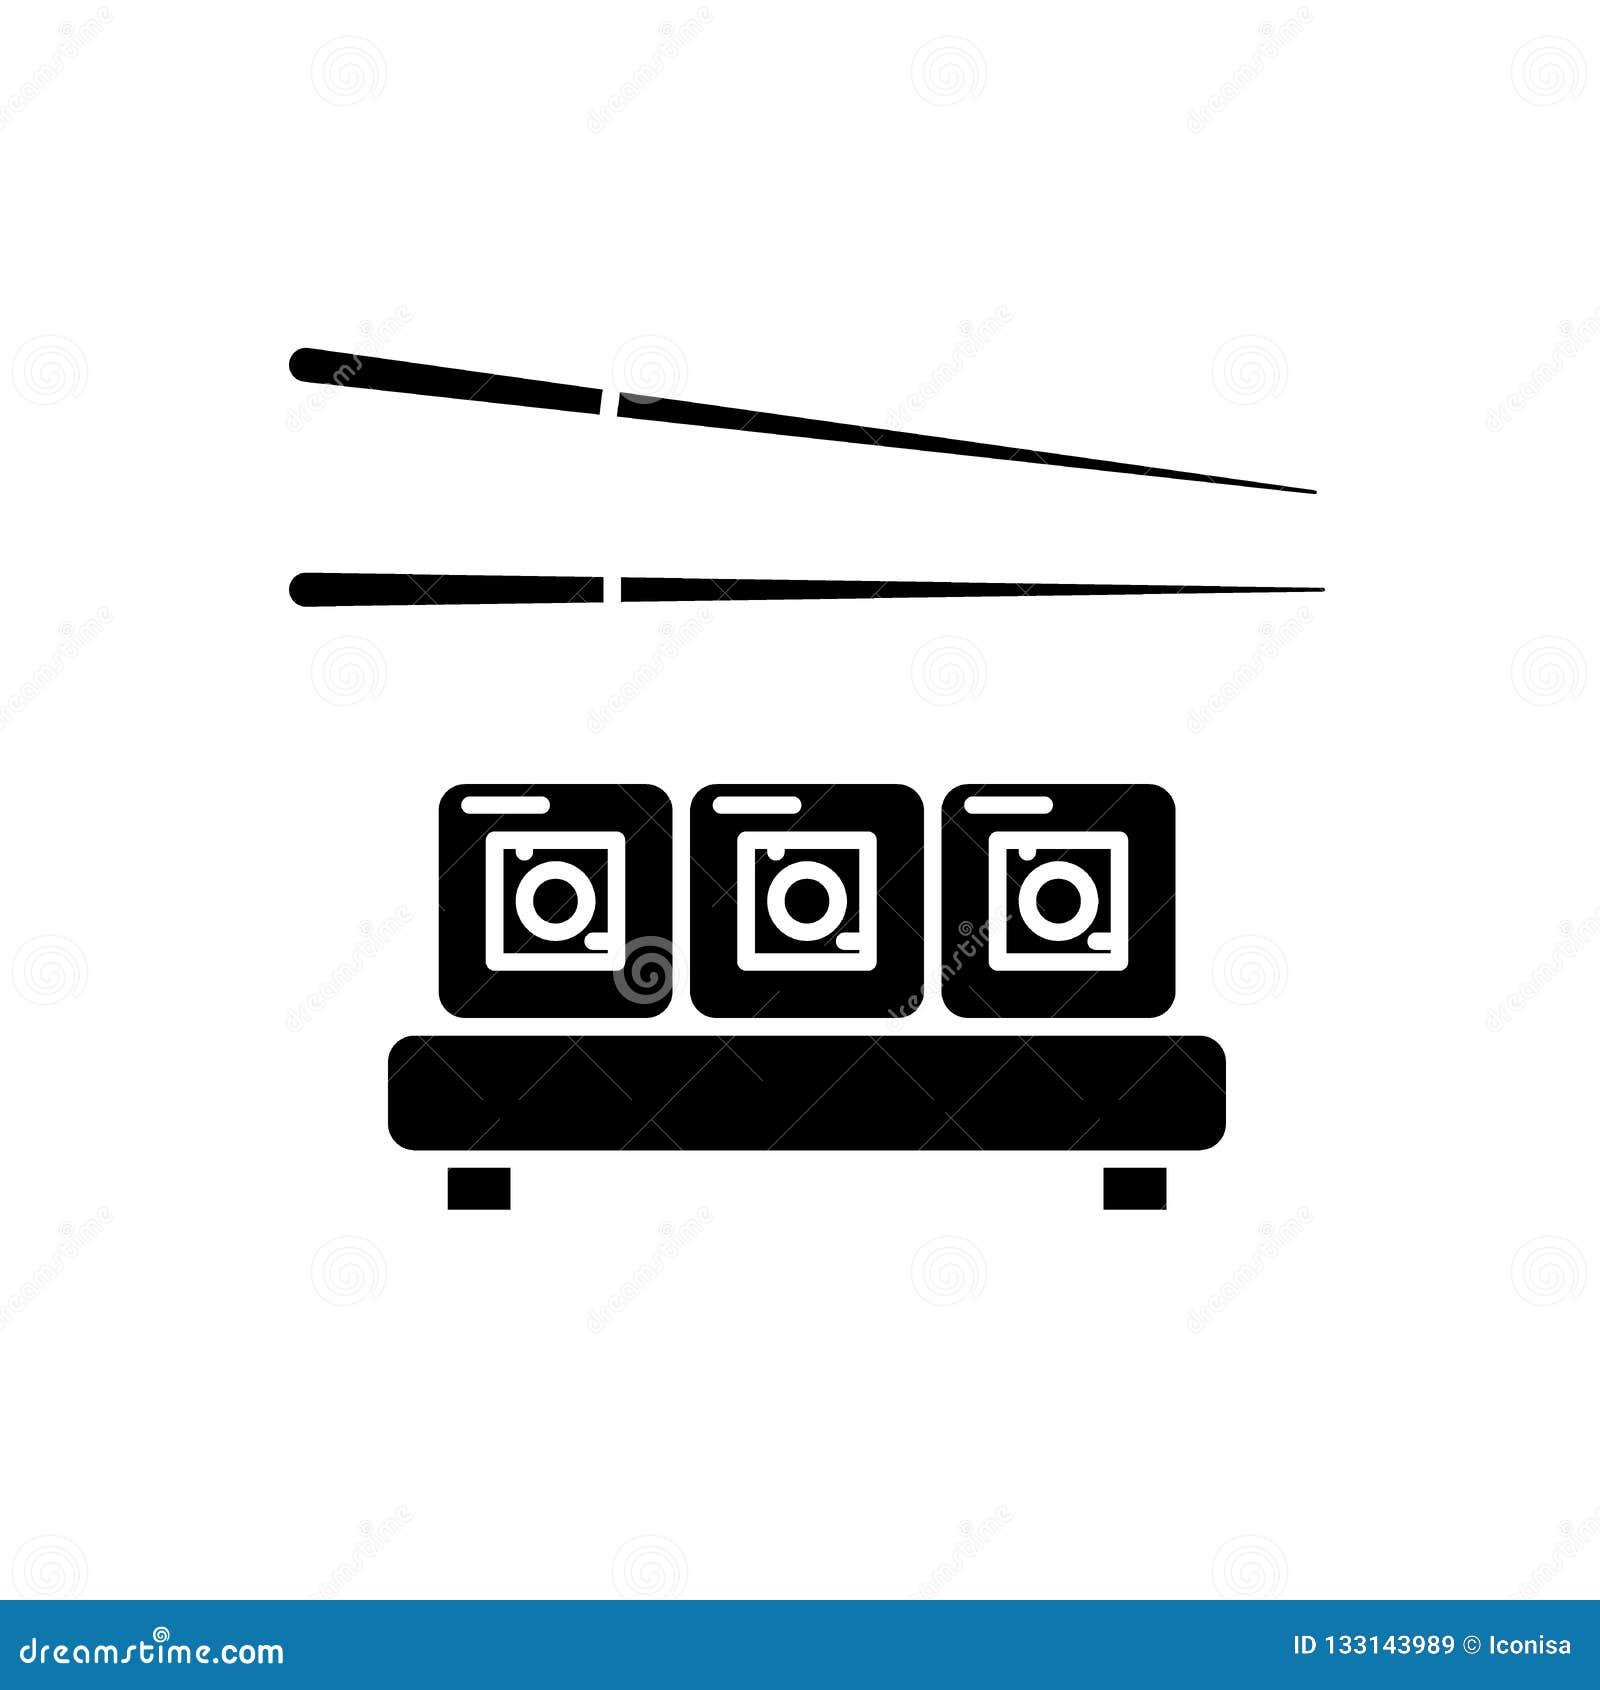 Sushi restaurant black icon, vector sign on isolated background. Sushi restaurant concept symbol, illustration